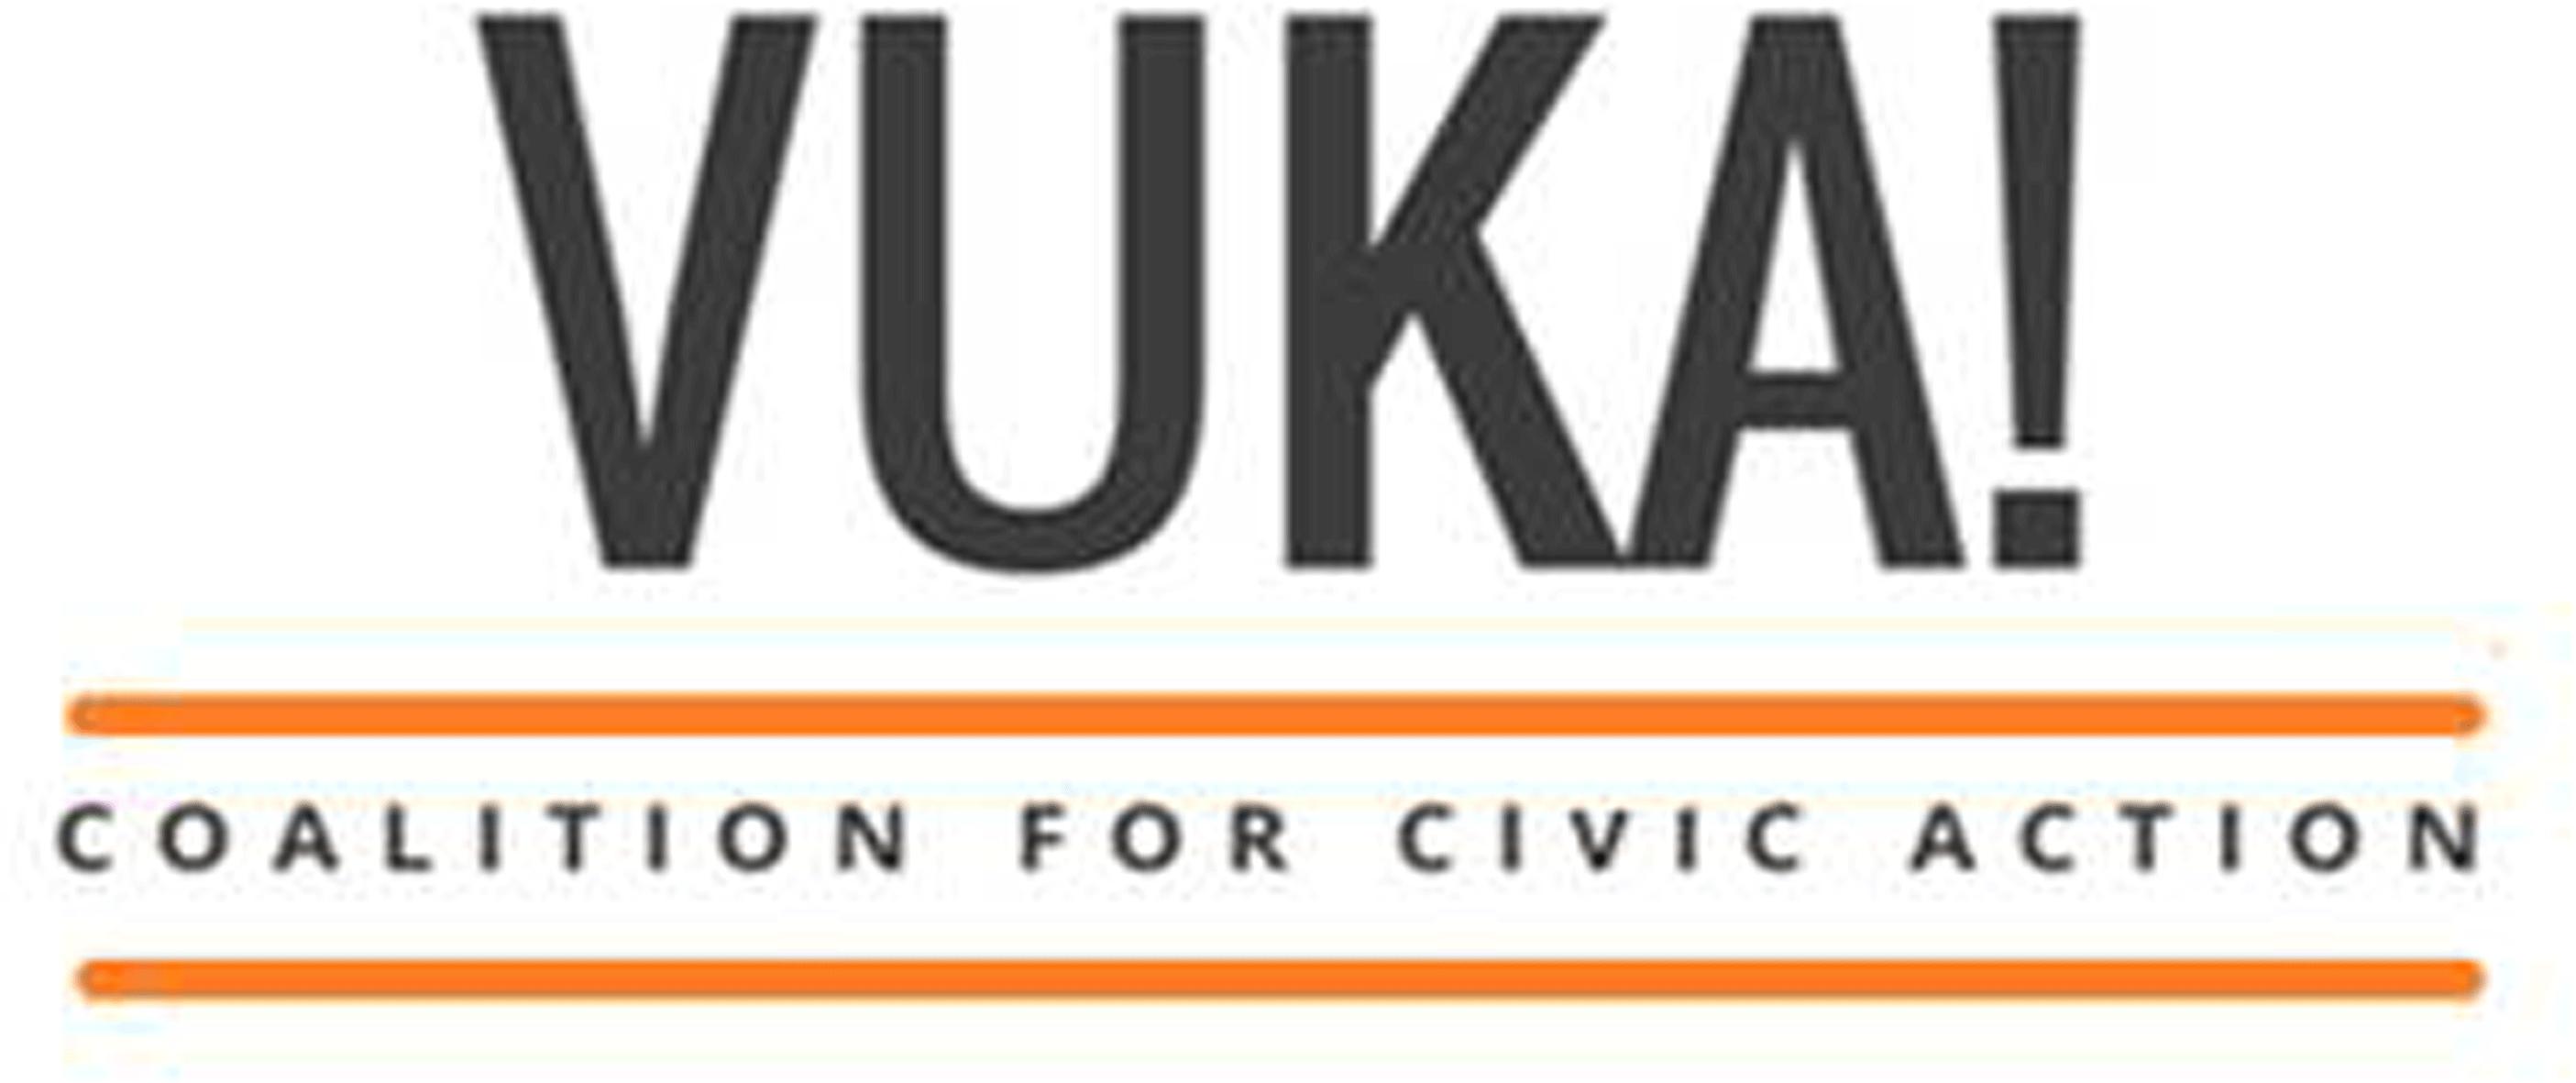 Vuka! Coalition for civic action, logo